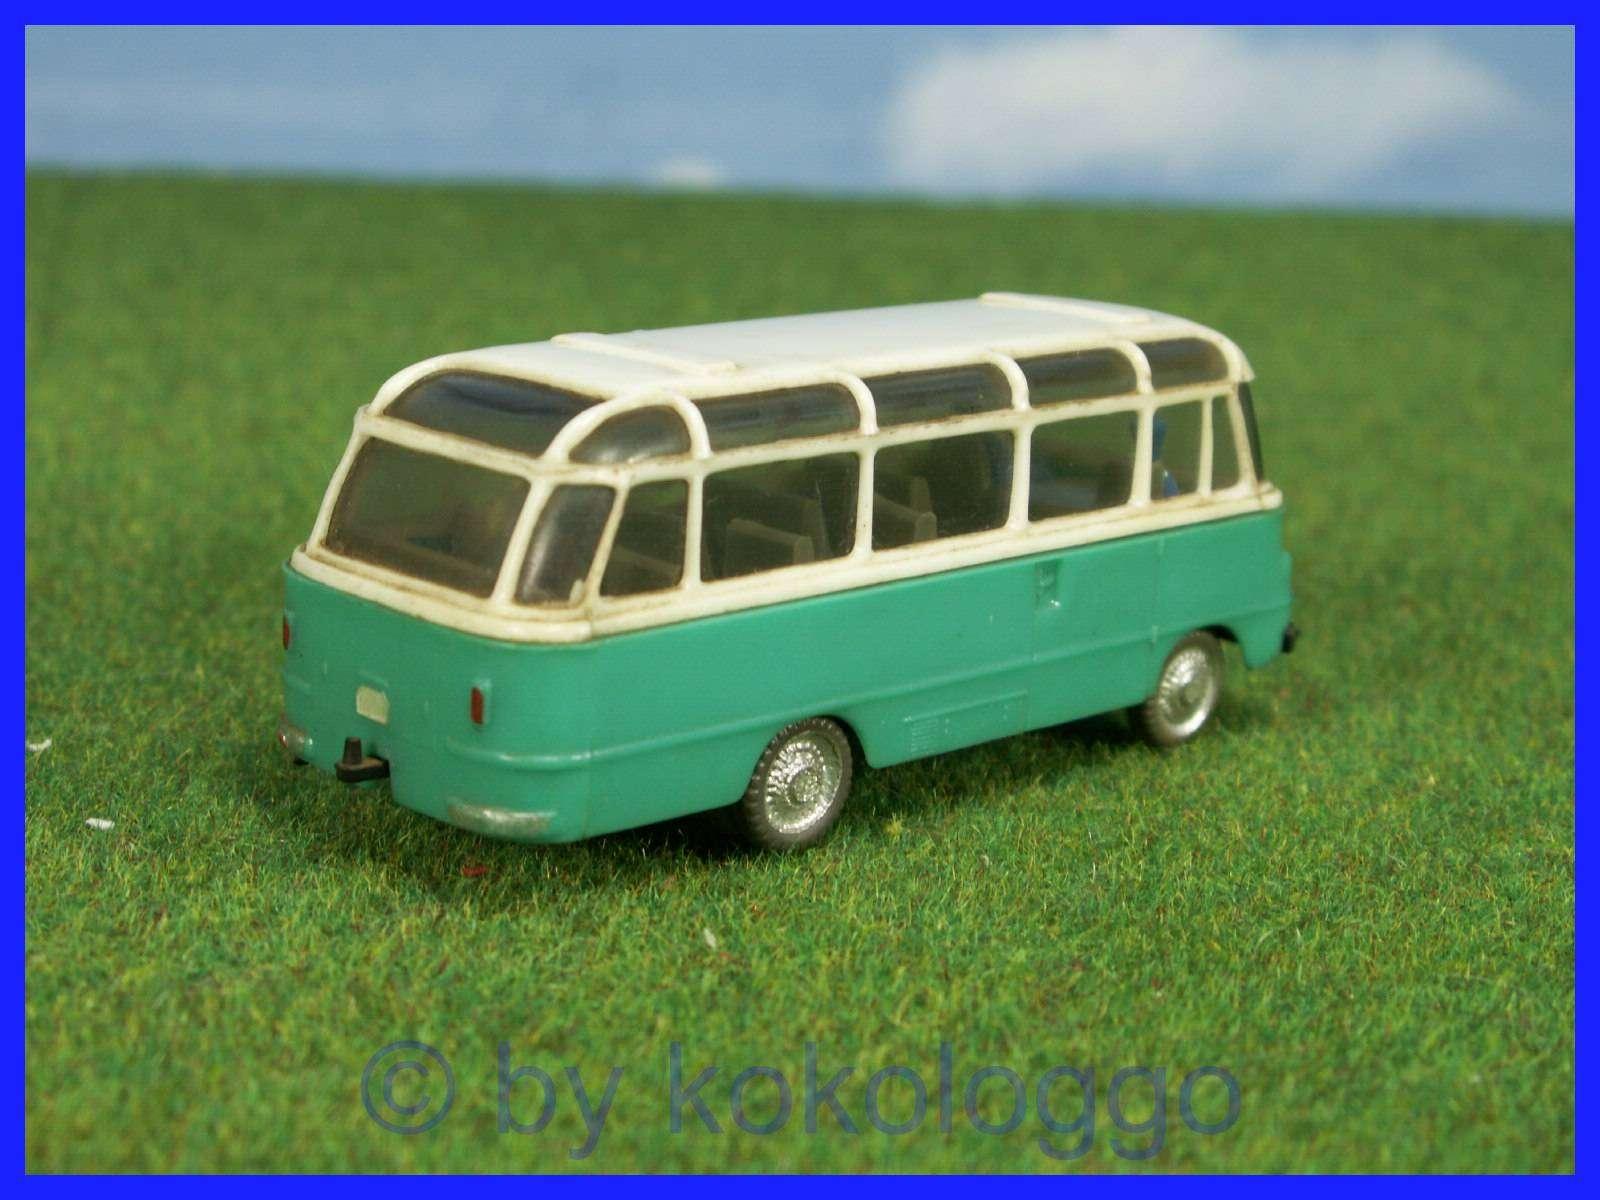 an121 h0 espewe 1 87 bus omnibus reisebus robur lo 2500 ebay. Black Bedroom Furniture Sets. Home Design Ideas